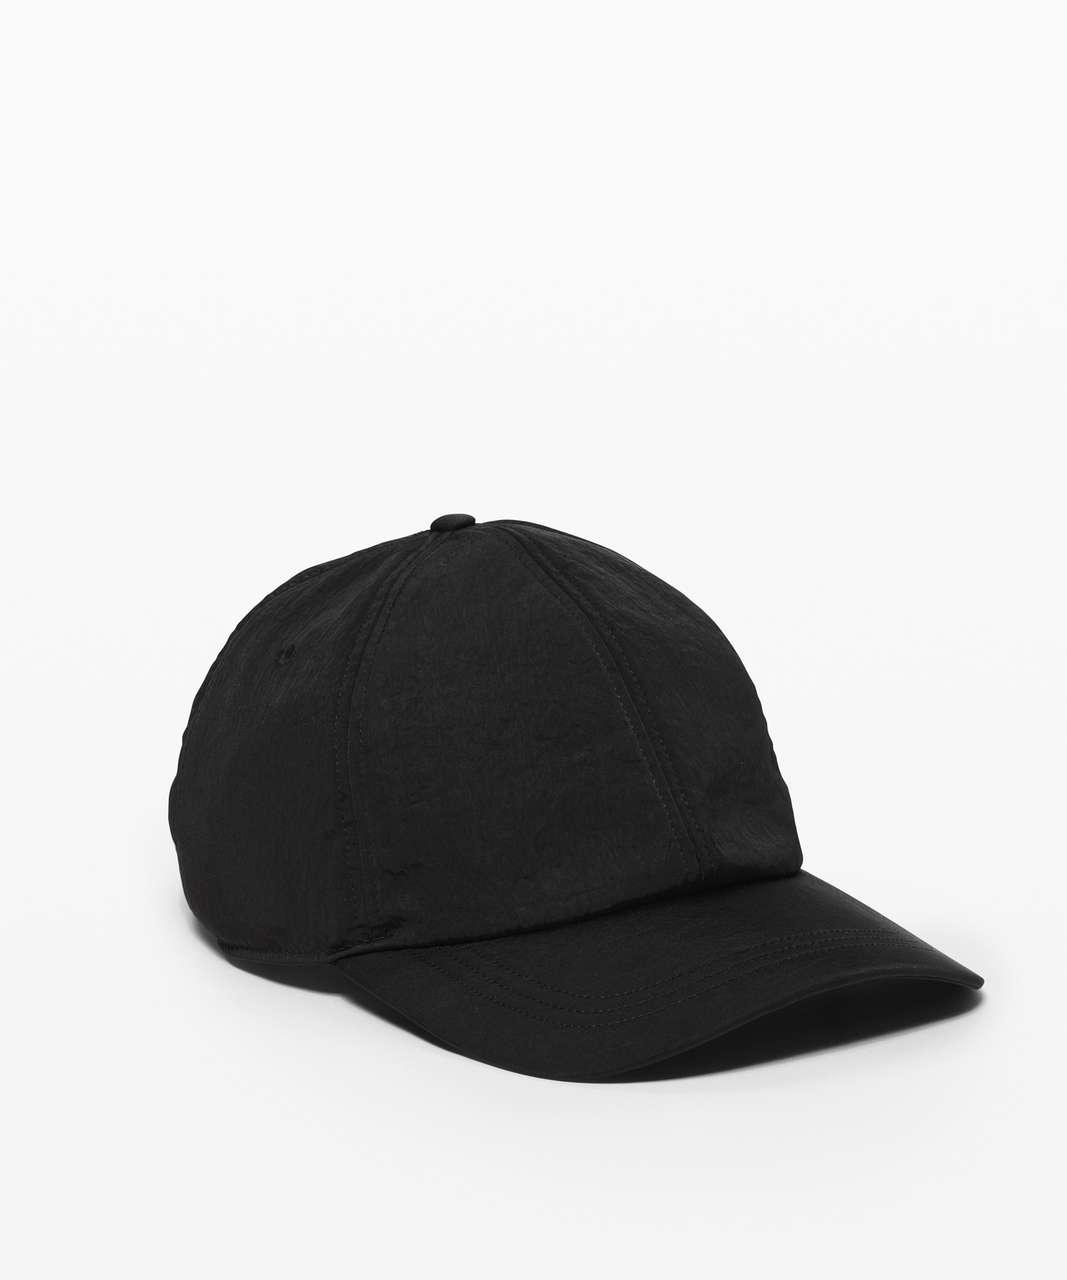 Lululemon Baller Hat II *Soft - Black (First Release)